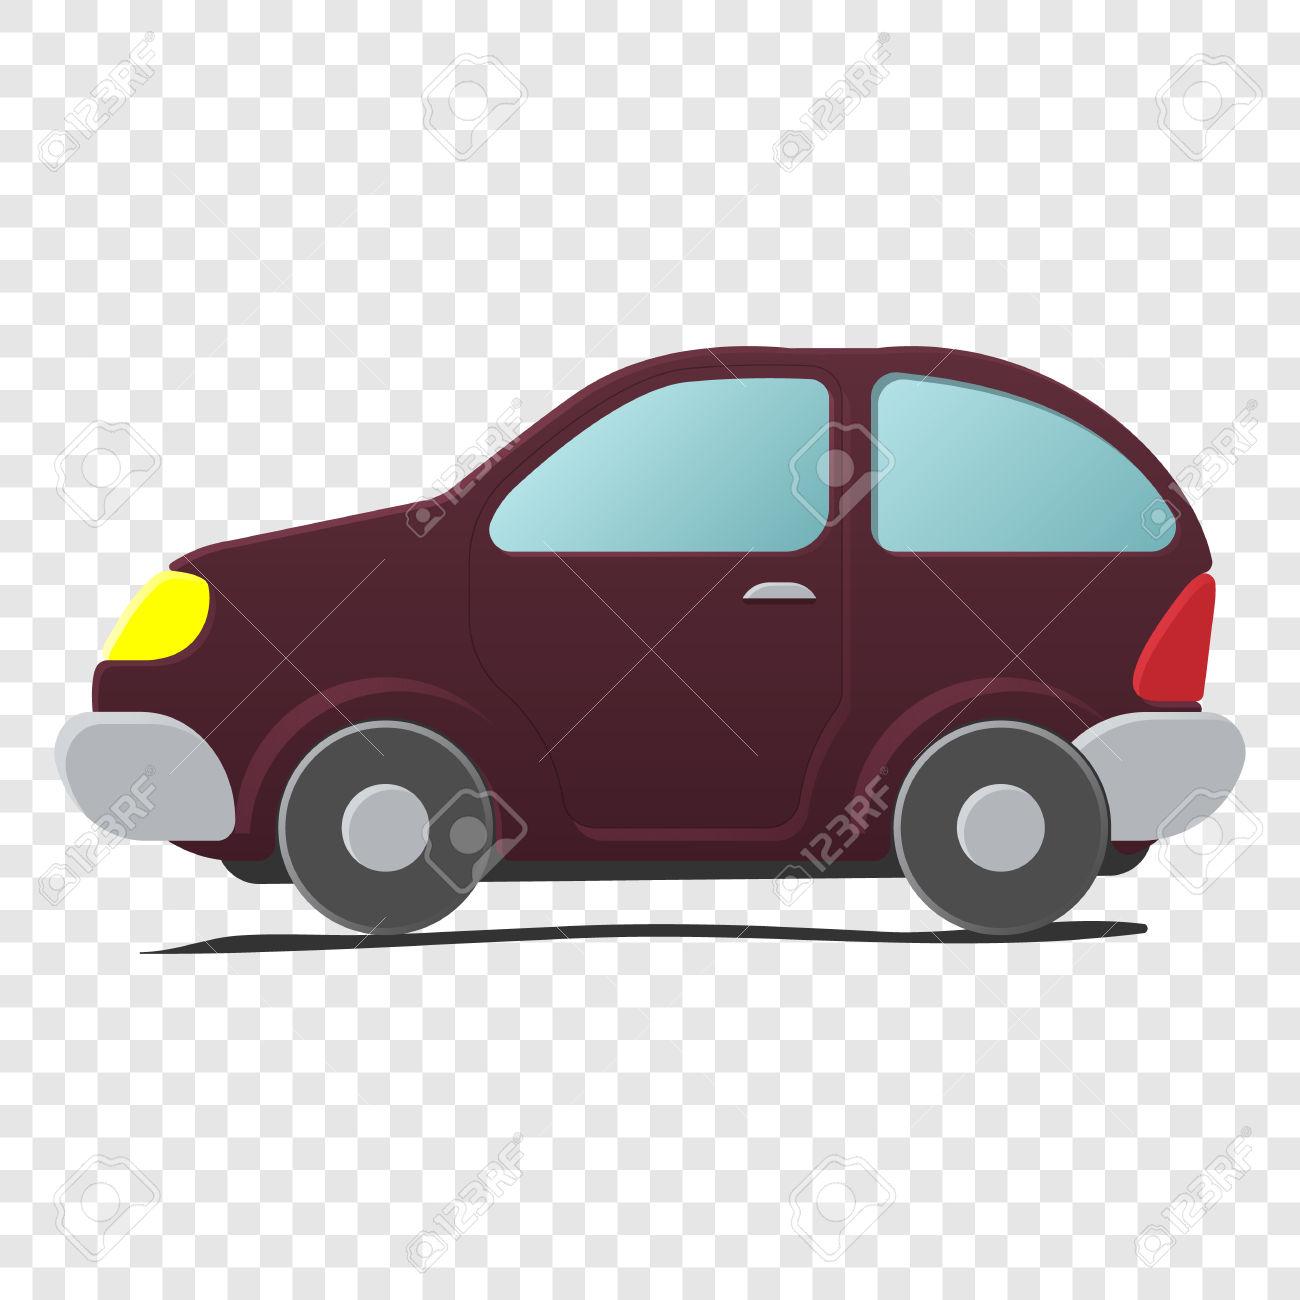 amazing car cliparts. Cars clipart transparent background